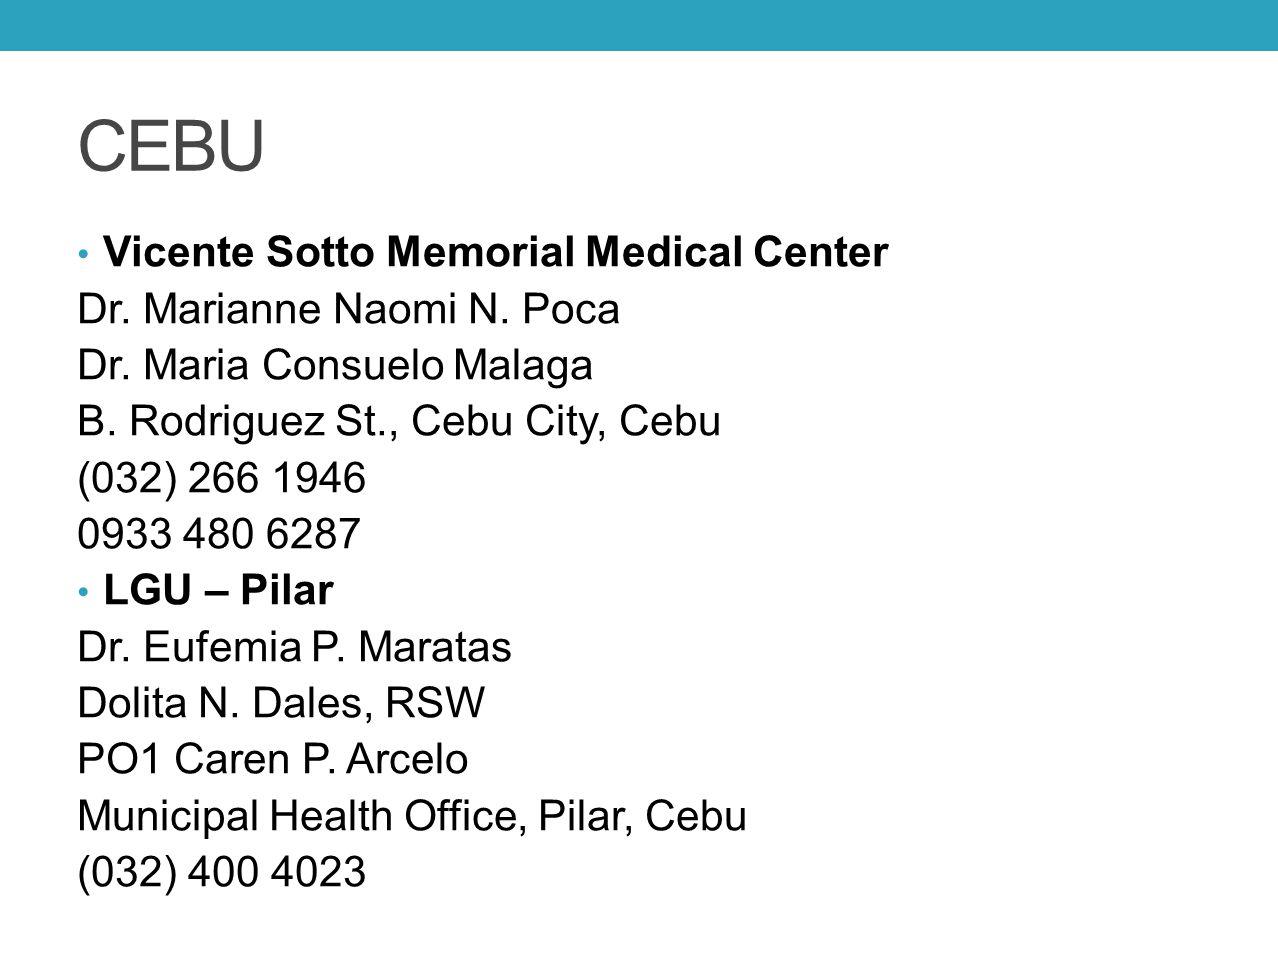 CEBU Vicente Sotto Memorial Medical Center Dr. Marianne Naomi N. Poca Dr. Maria Consuelo Malaga B. Rodriguez St., Cebu City, Cebu (032) 266 1946 0933